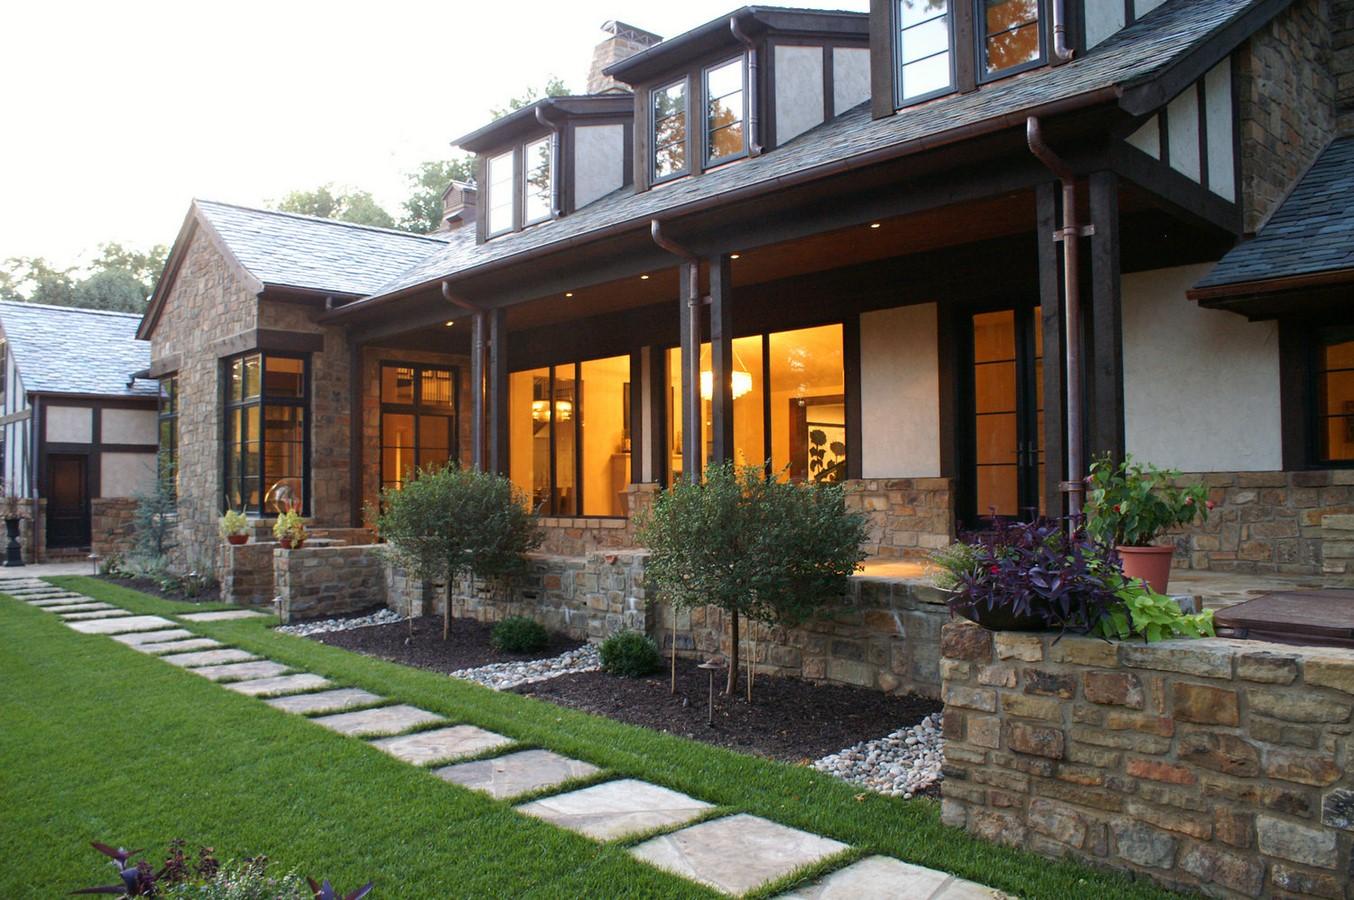 Architects in Kansas city - Top 90 Architects in Kansas city - Sheet85